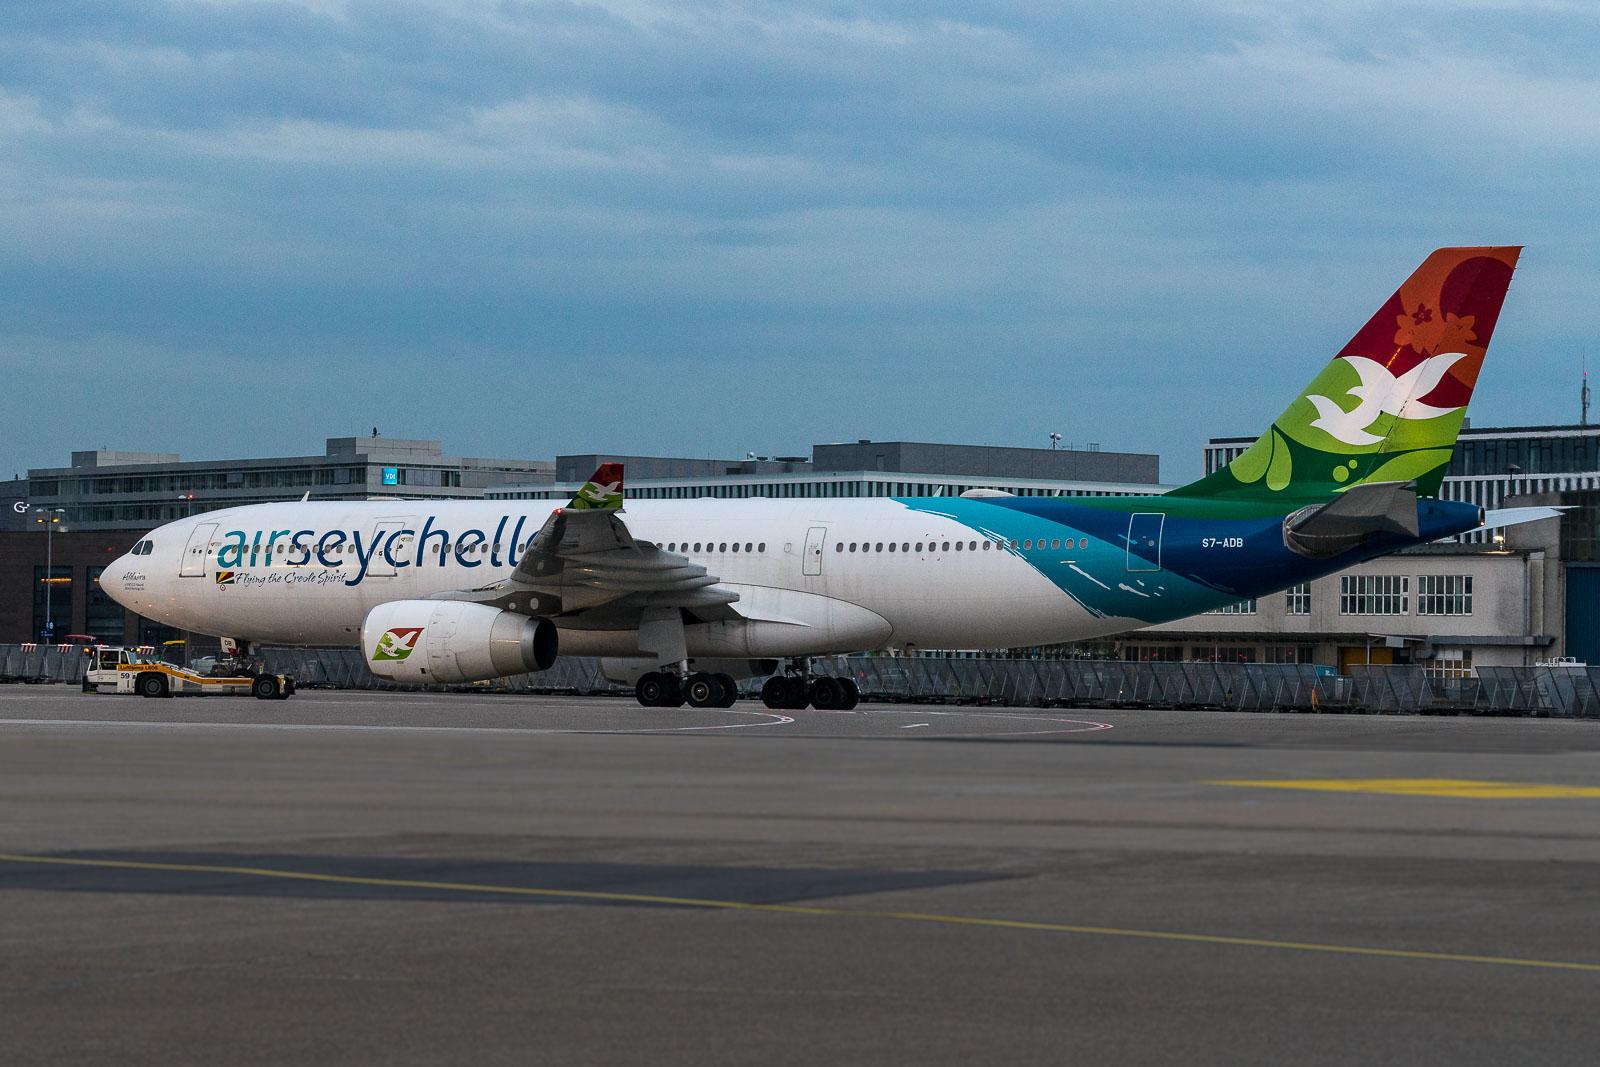 Air Seychelles in Düsseldorf